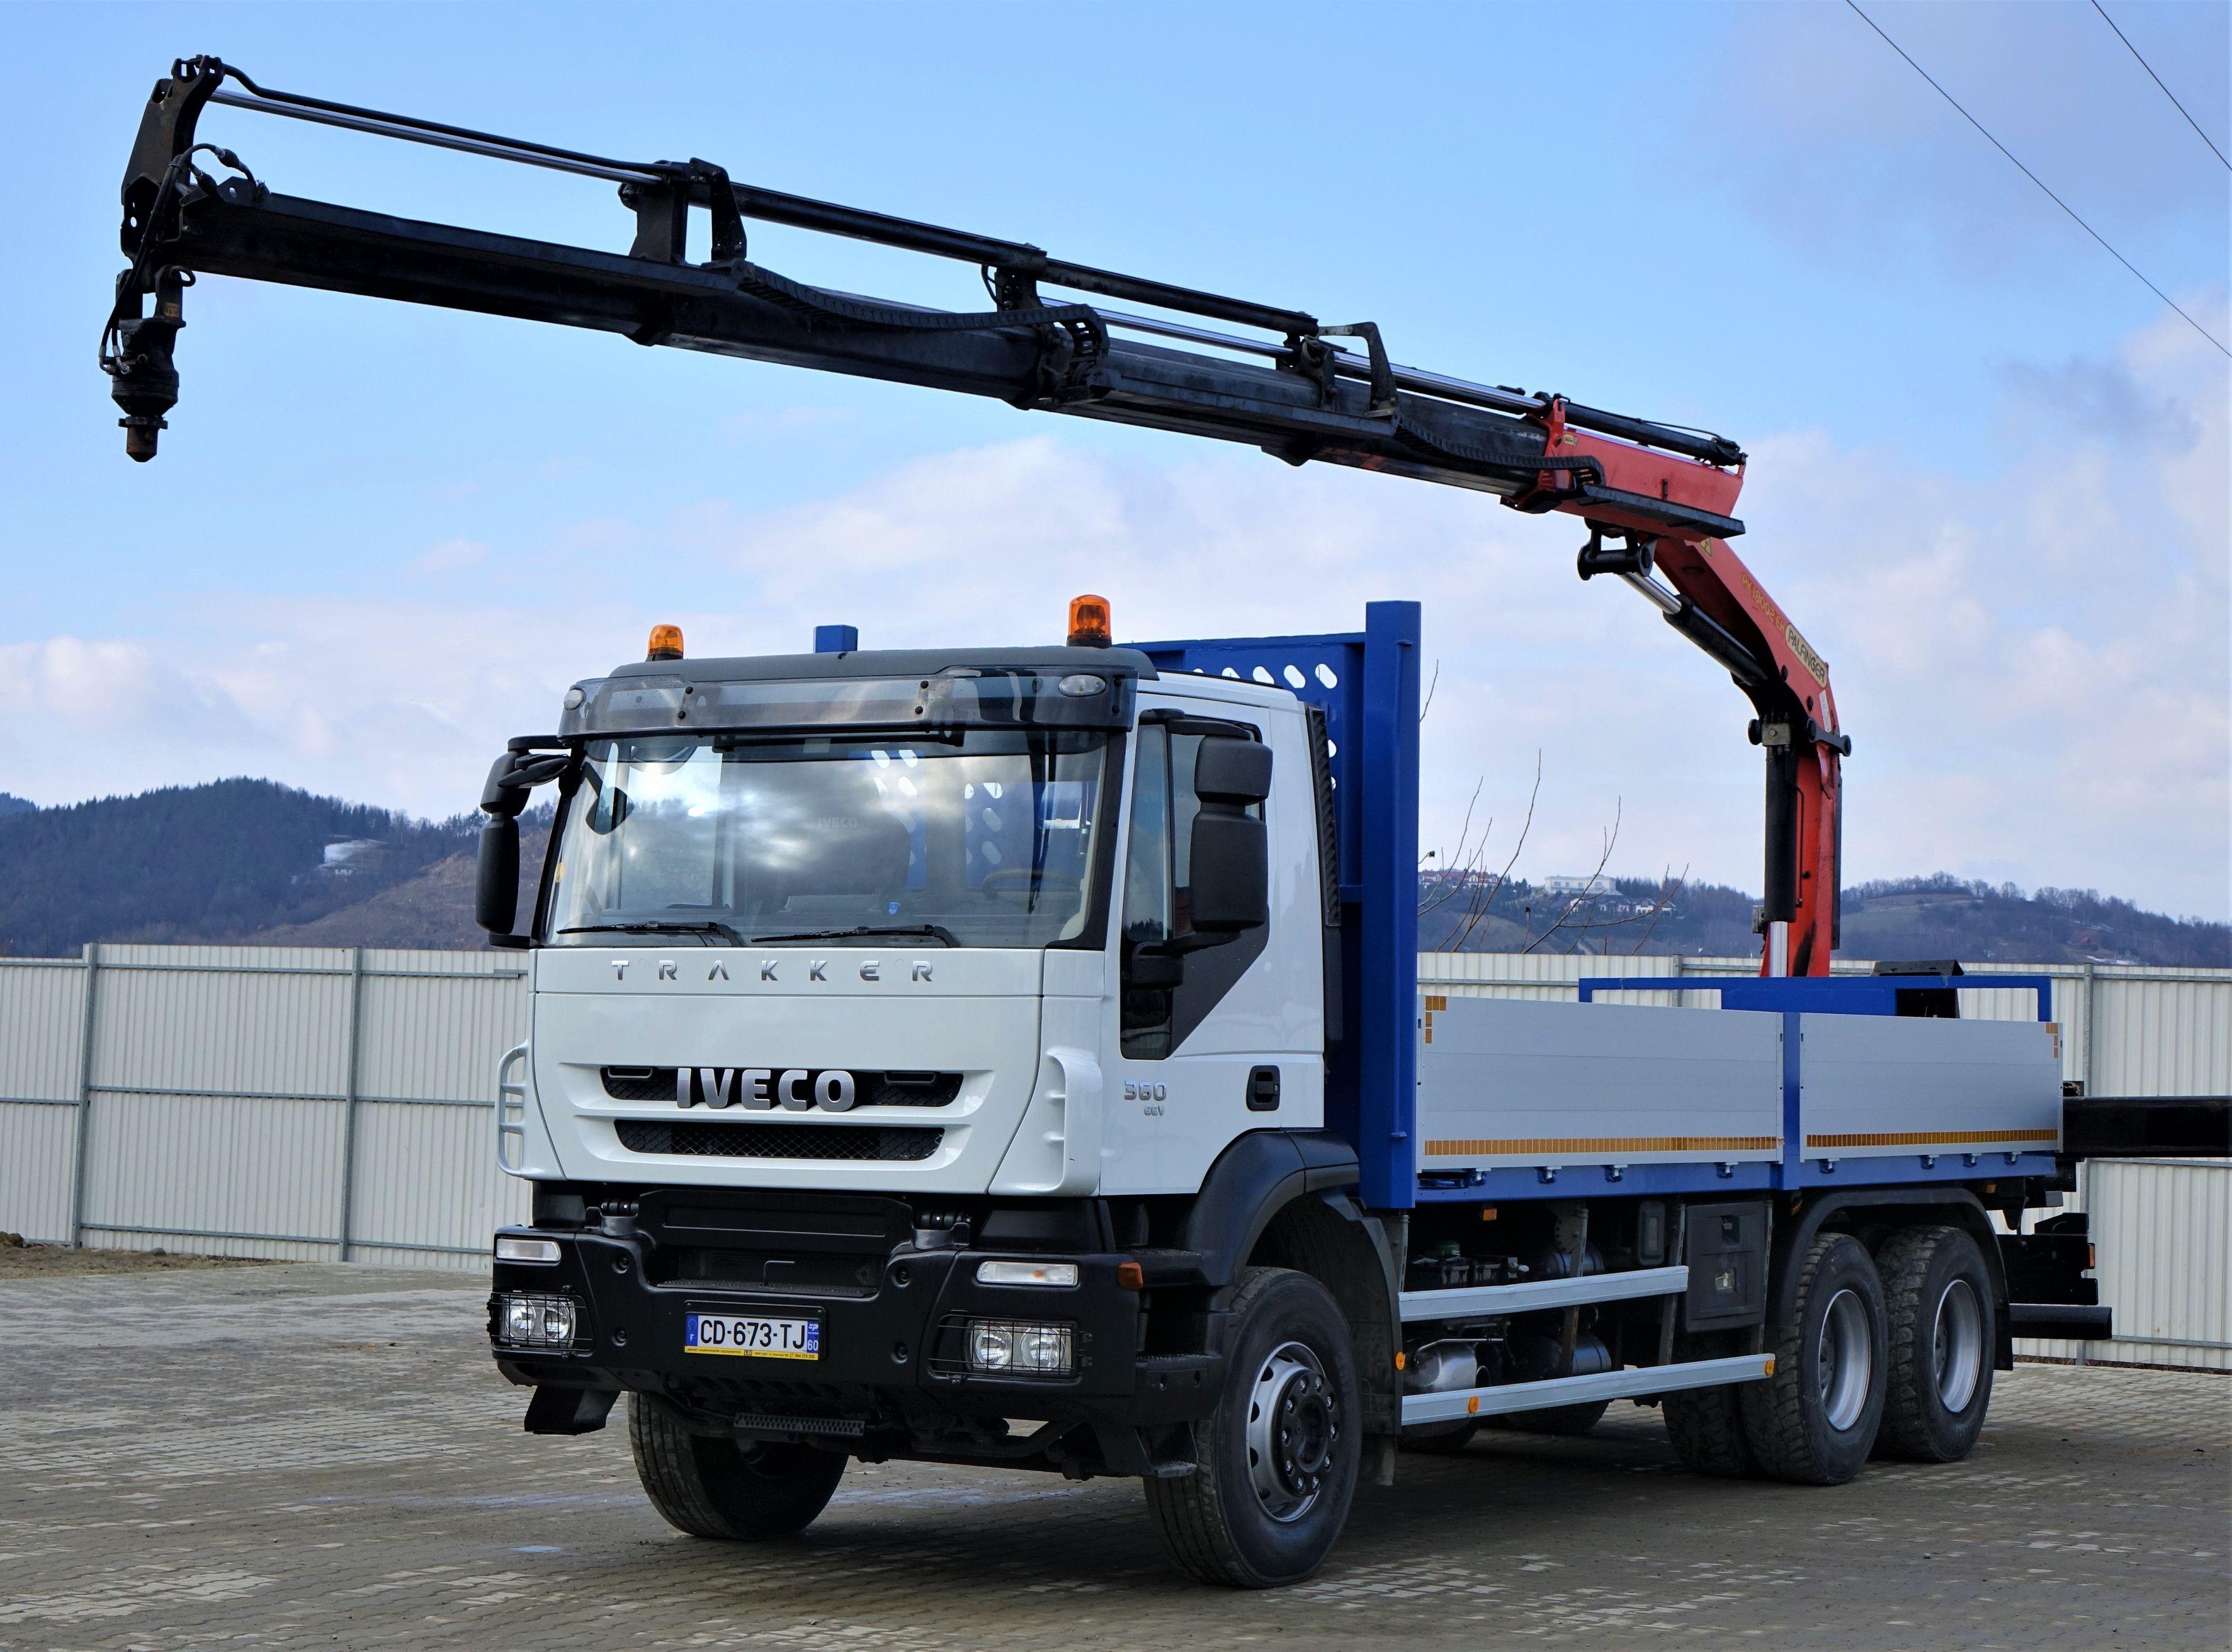 2013-iveco-trakker-360-349752-equipment-cover-image